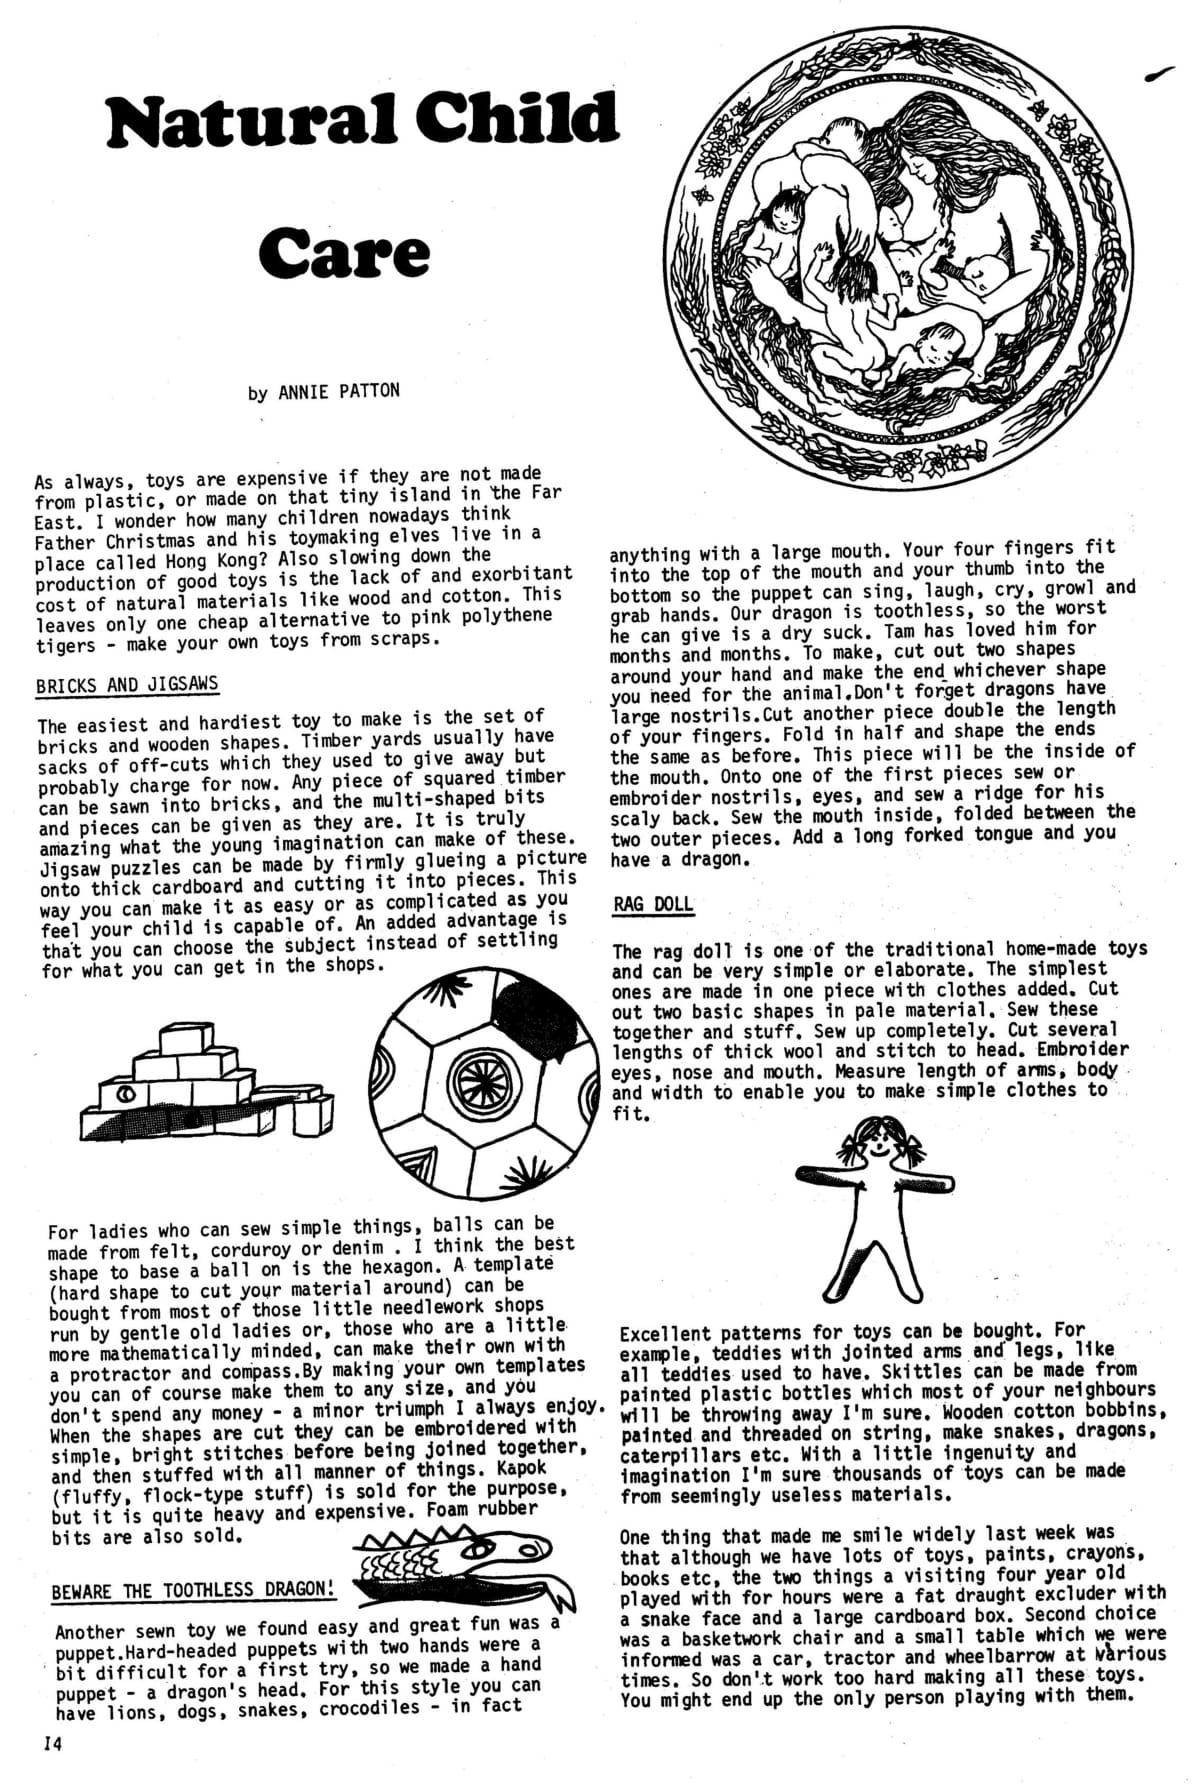 seed-v3-n11-nov1974-14.jpg